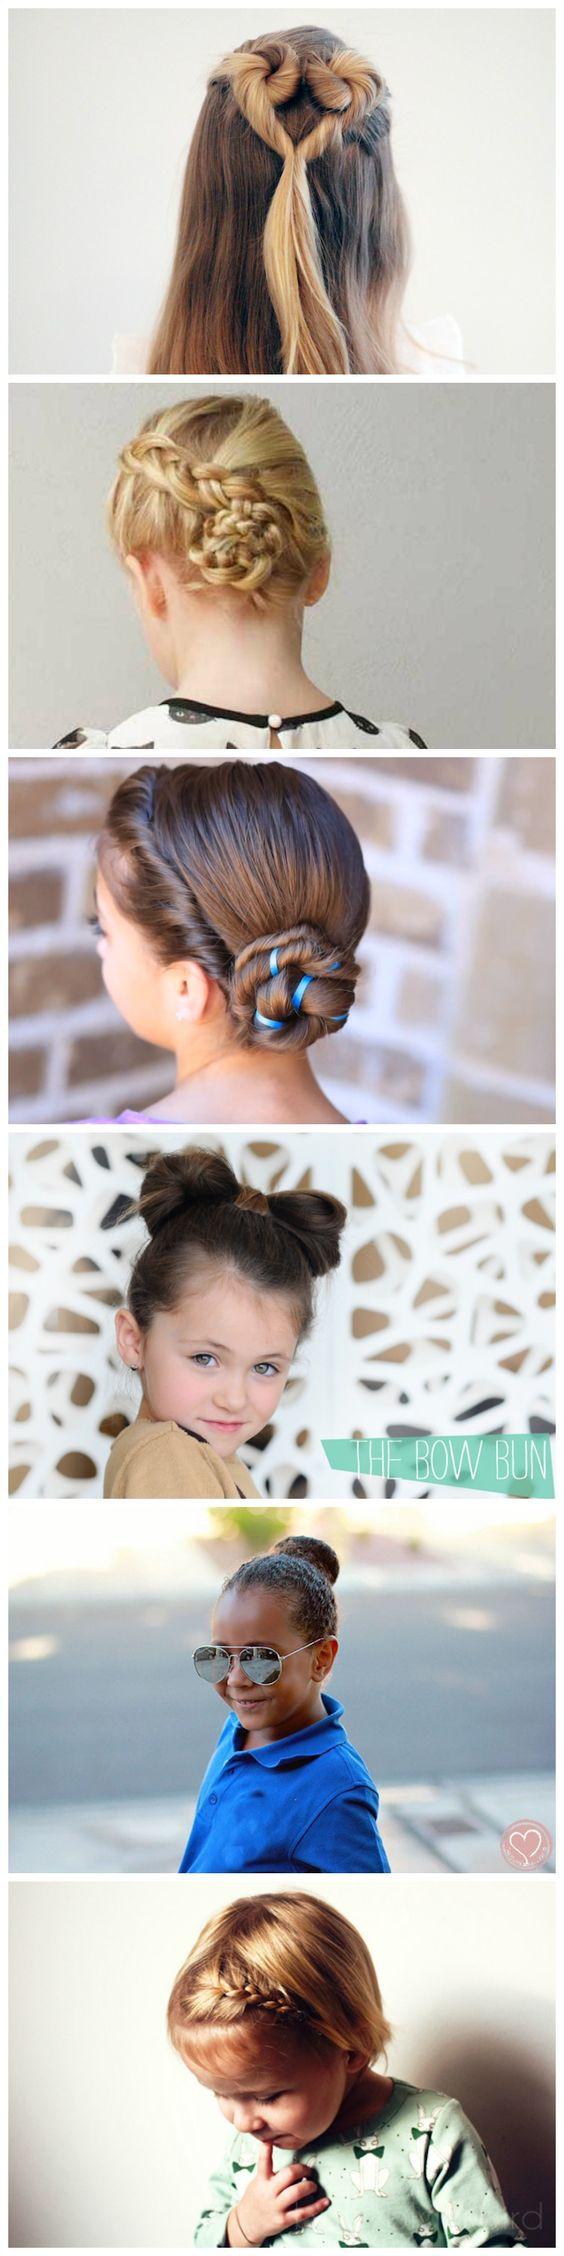 disney princess hairstyles hair tutorials pinterest disney